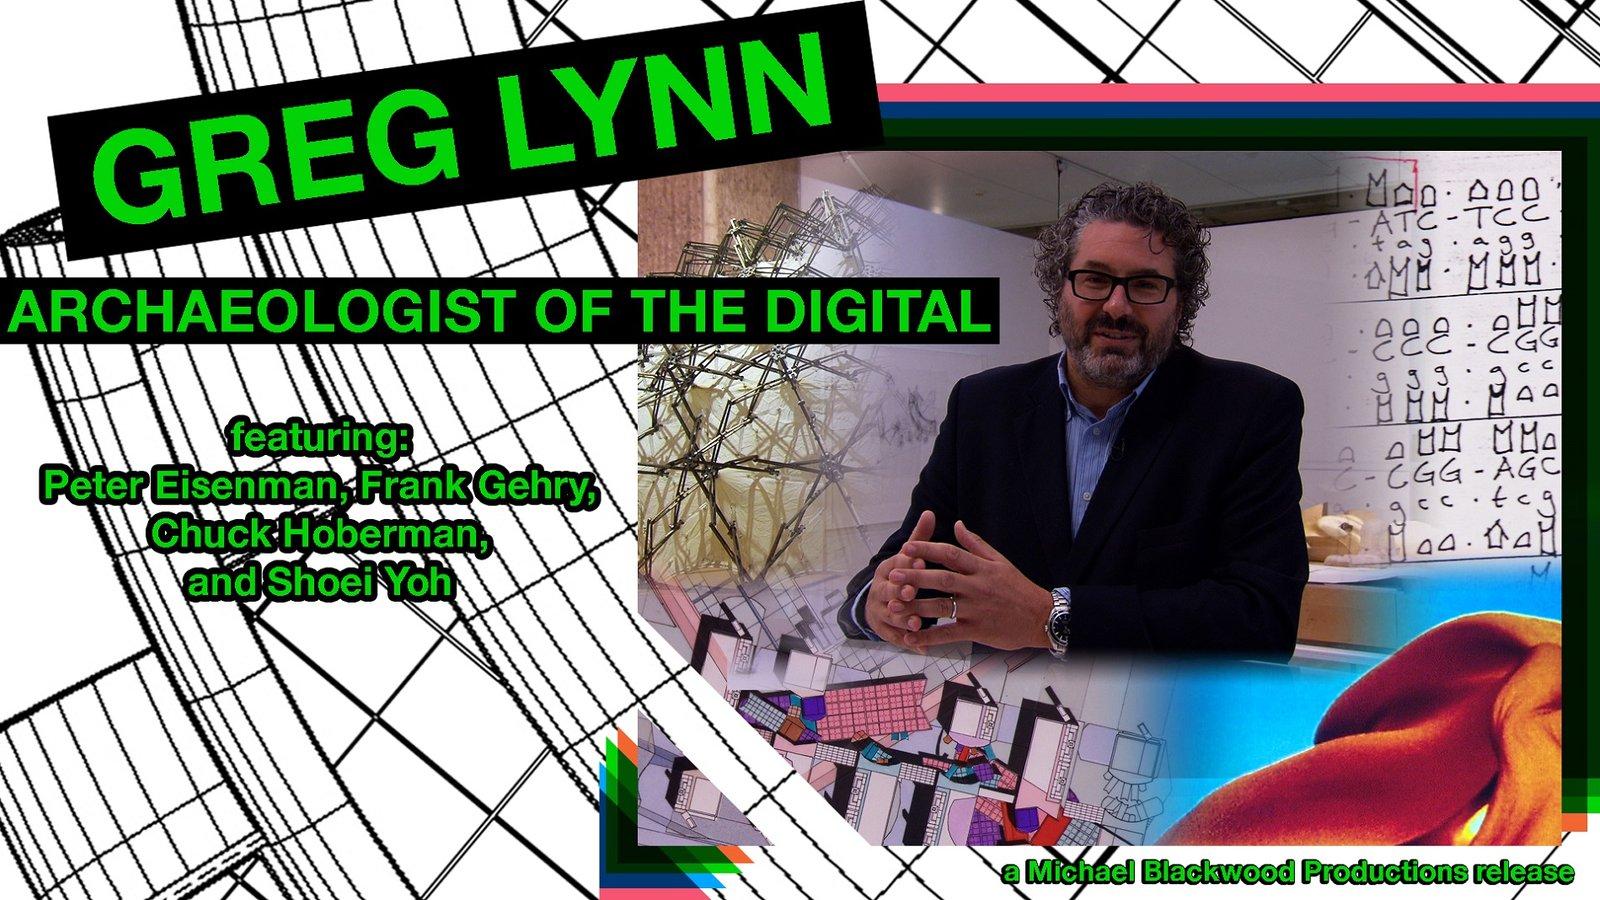 Greg Lynn - Archaeologist of the Digital